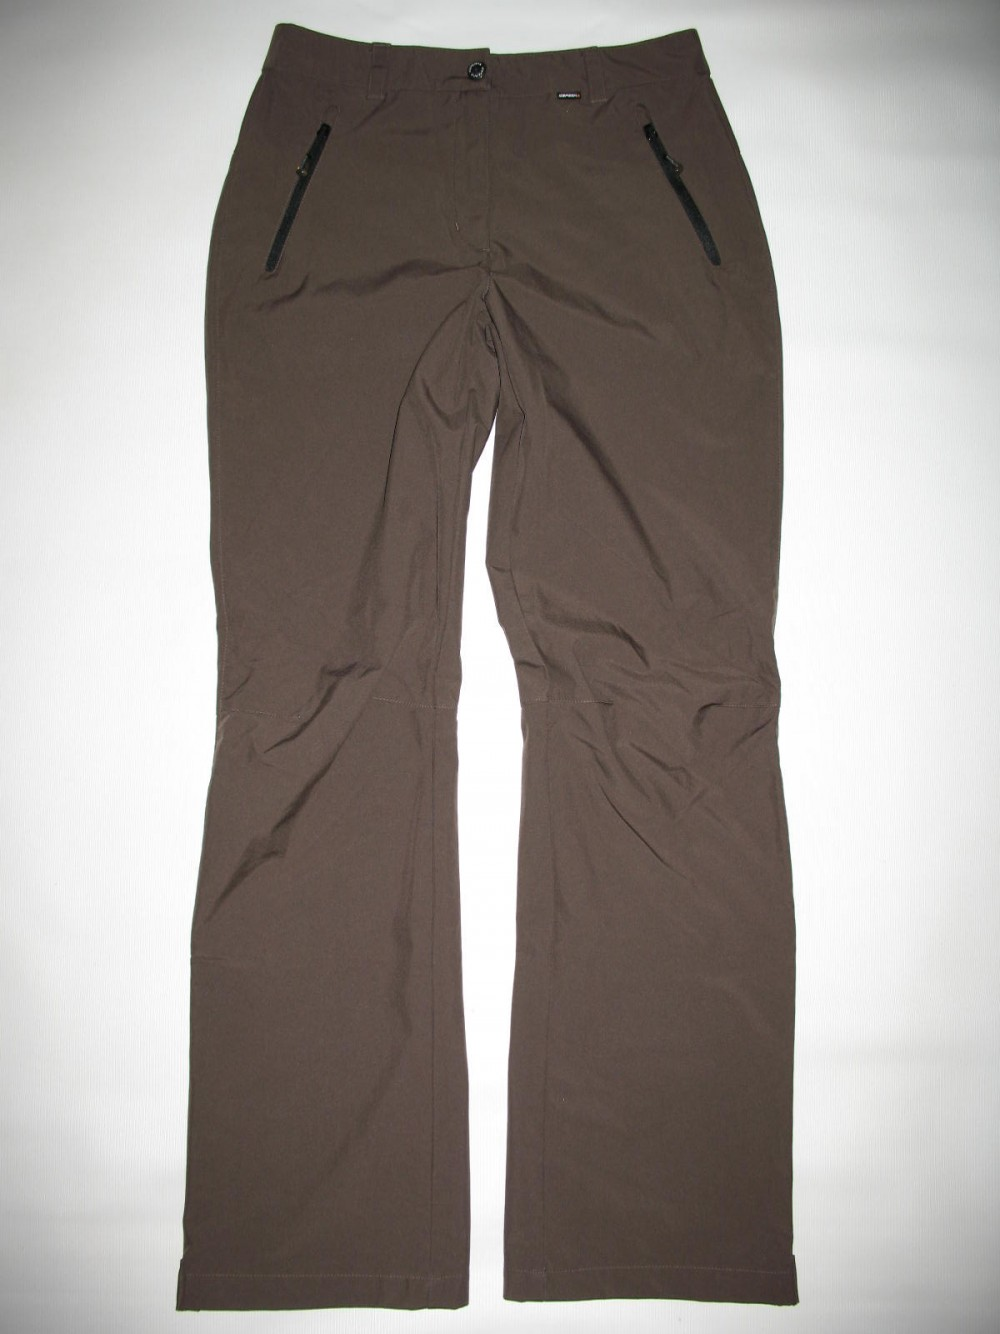 Штаны ICEPEAK softshell light pants lady (размер 36-S/M) - 2